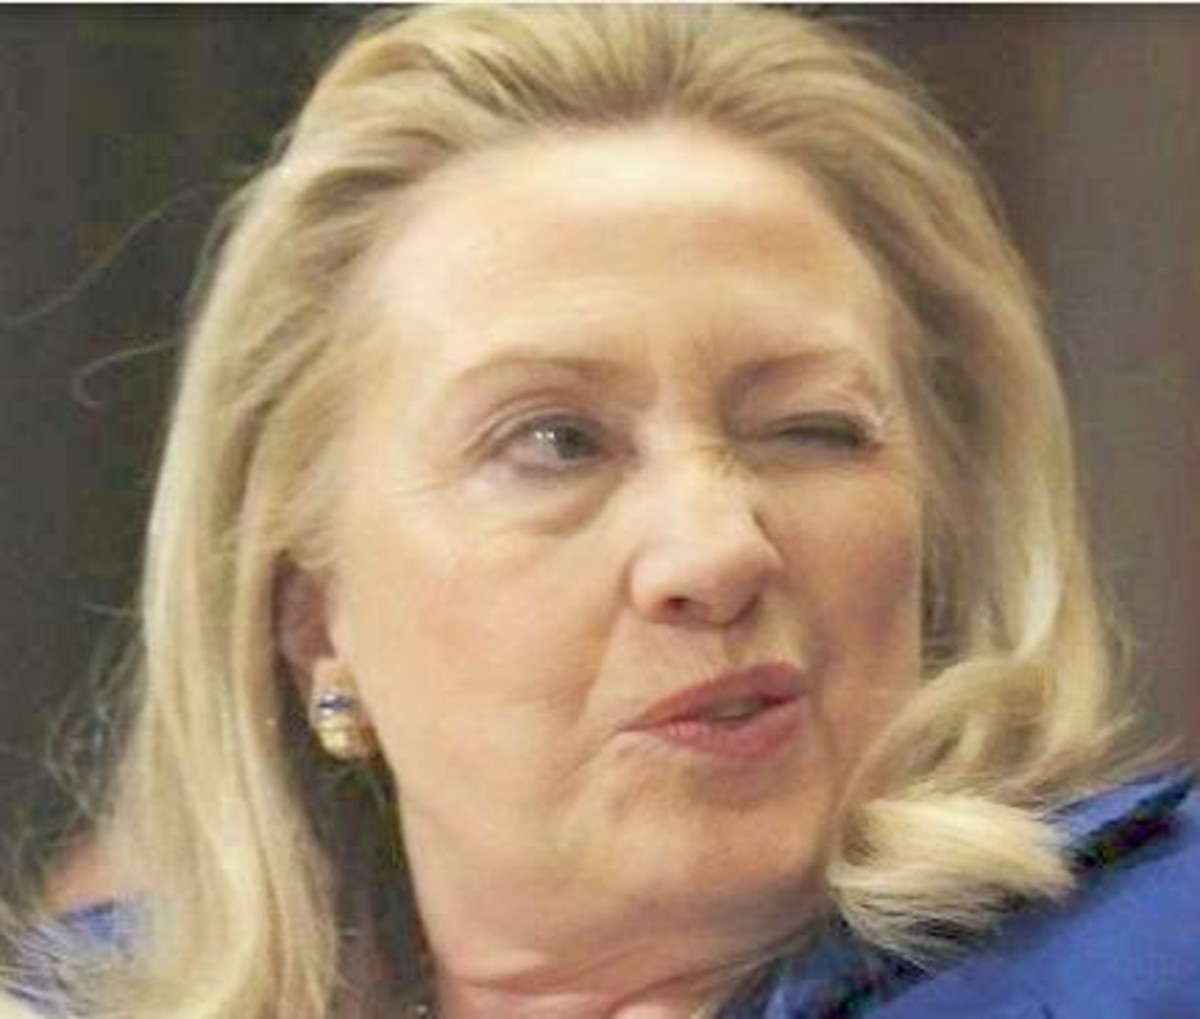 hillary-clinton-security-inquiryha-ha-ha-ha-ha